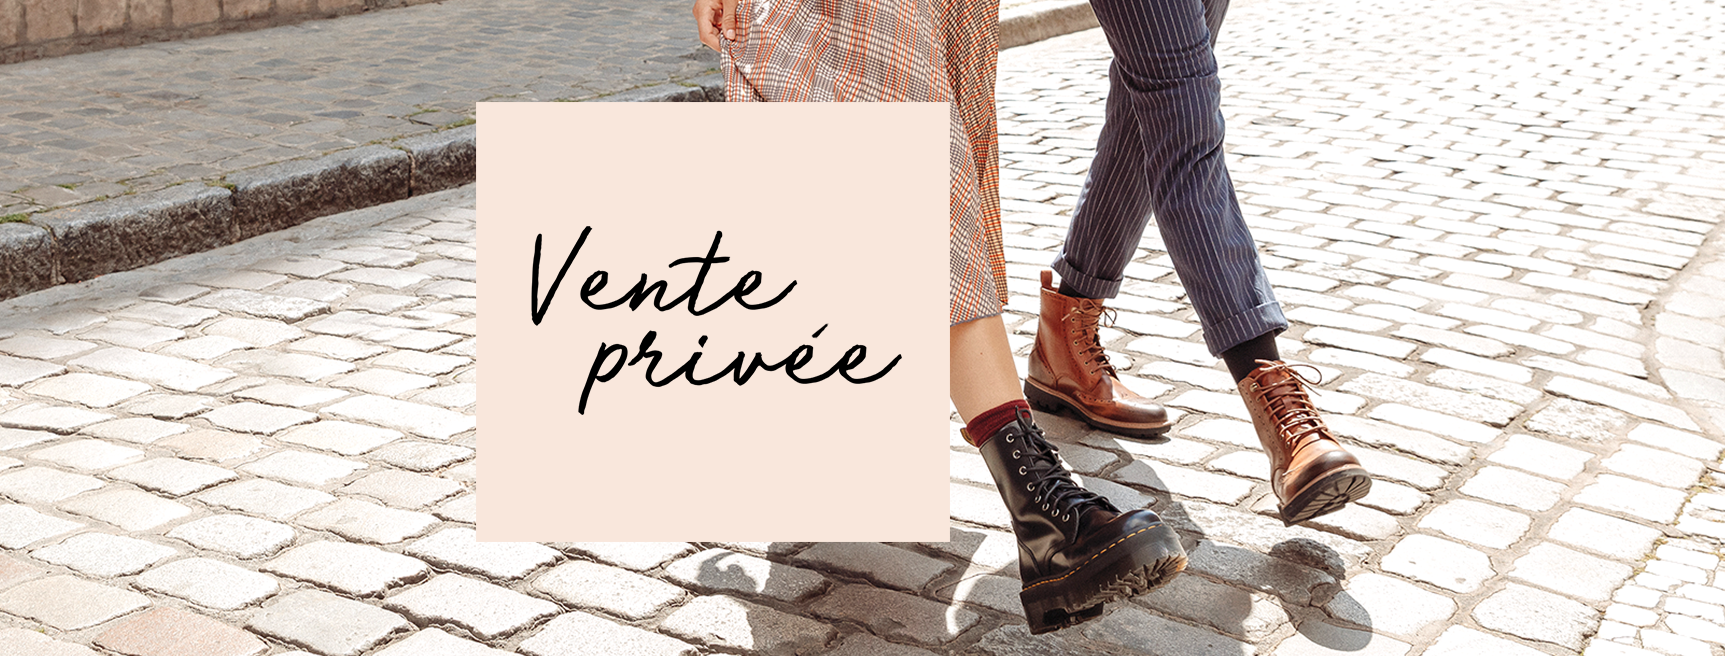 Vente privée JEF Chaussures